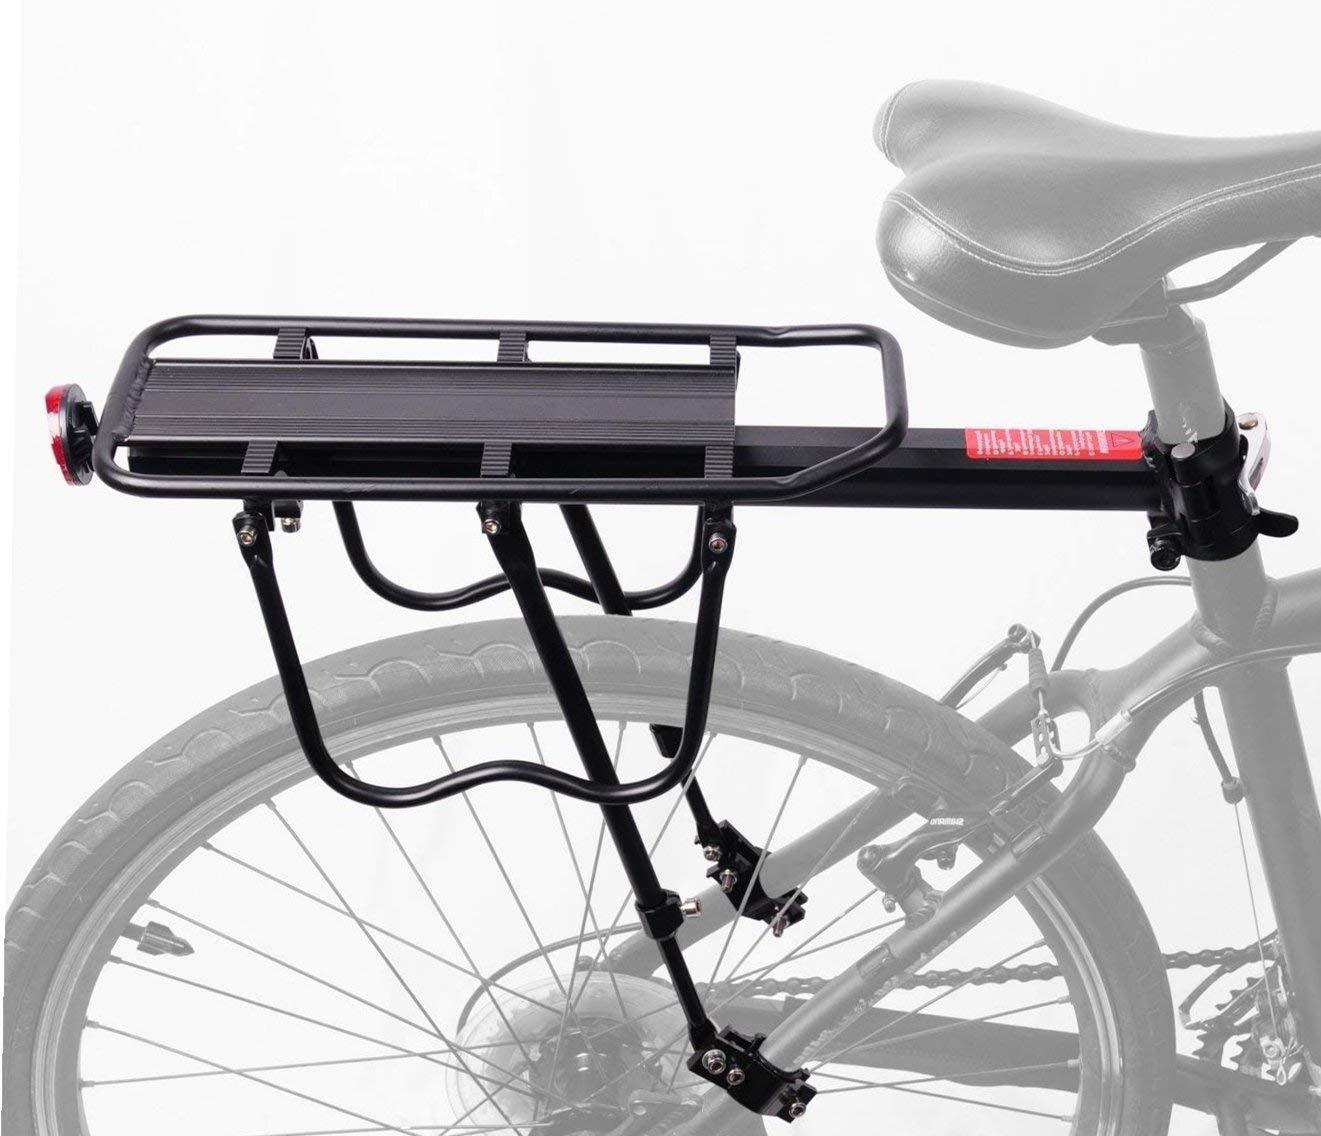 Acomfort 110 Lbs Capacity Adjustable Bike Luggage Cargo Rack Bicycle Accessories